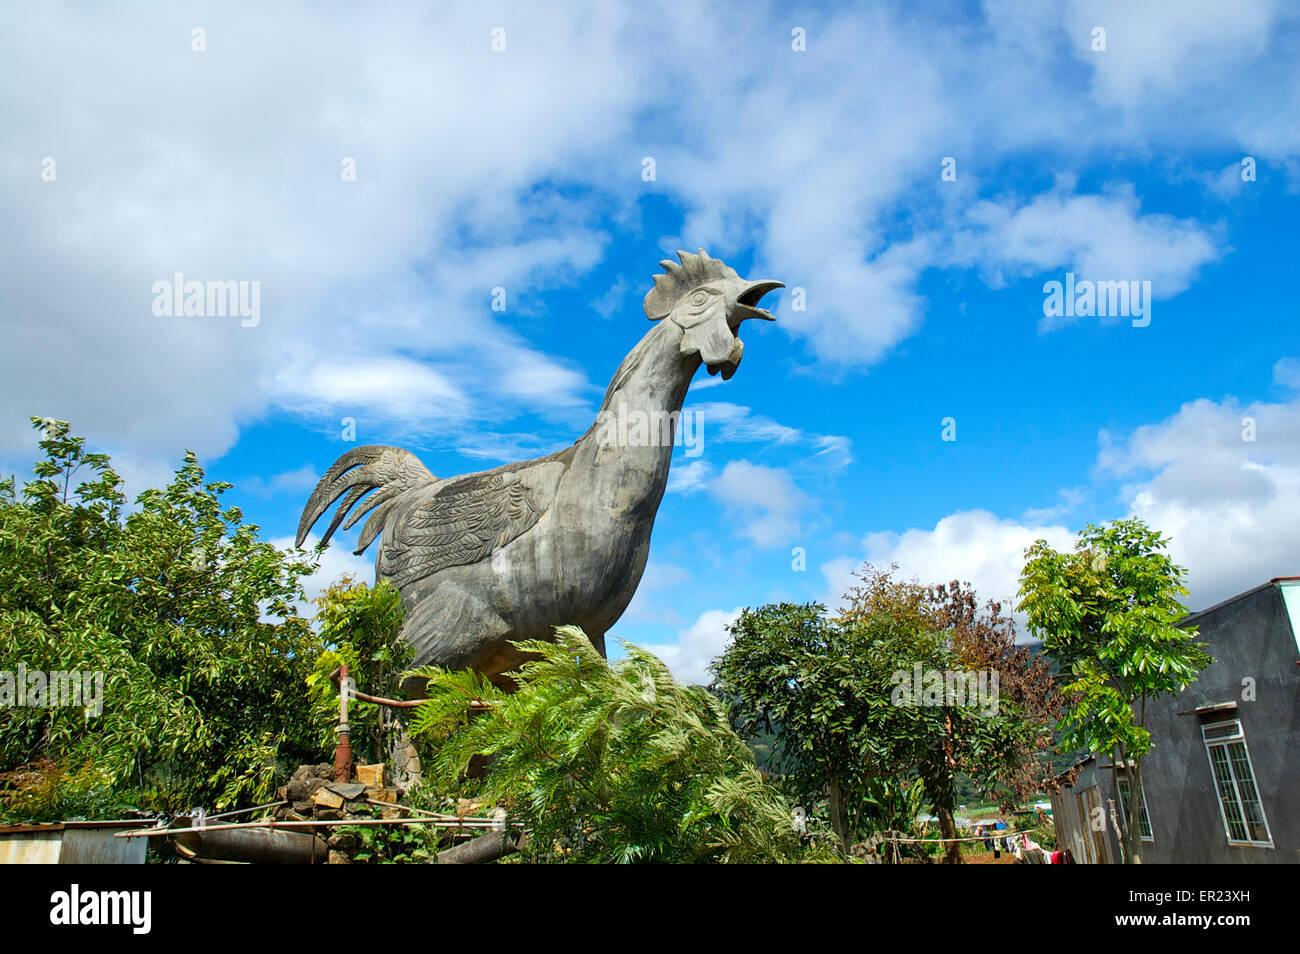 Five metre high statue of a chicken, Lang Con Ga, near Da Lat, Vietnam. Stock Photo